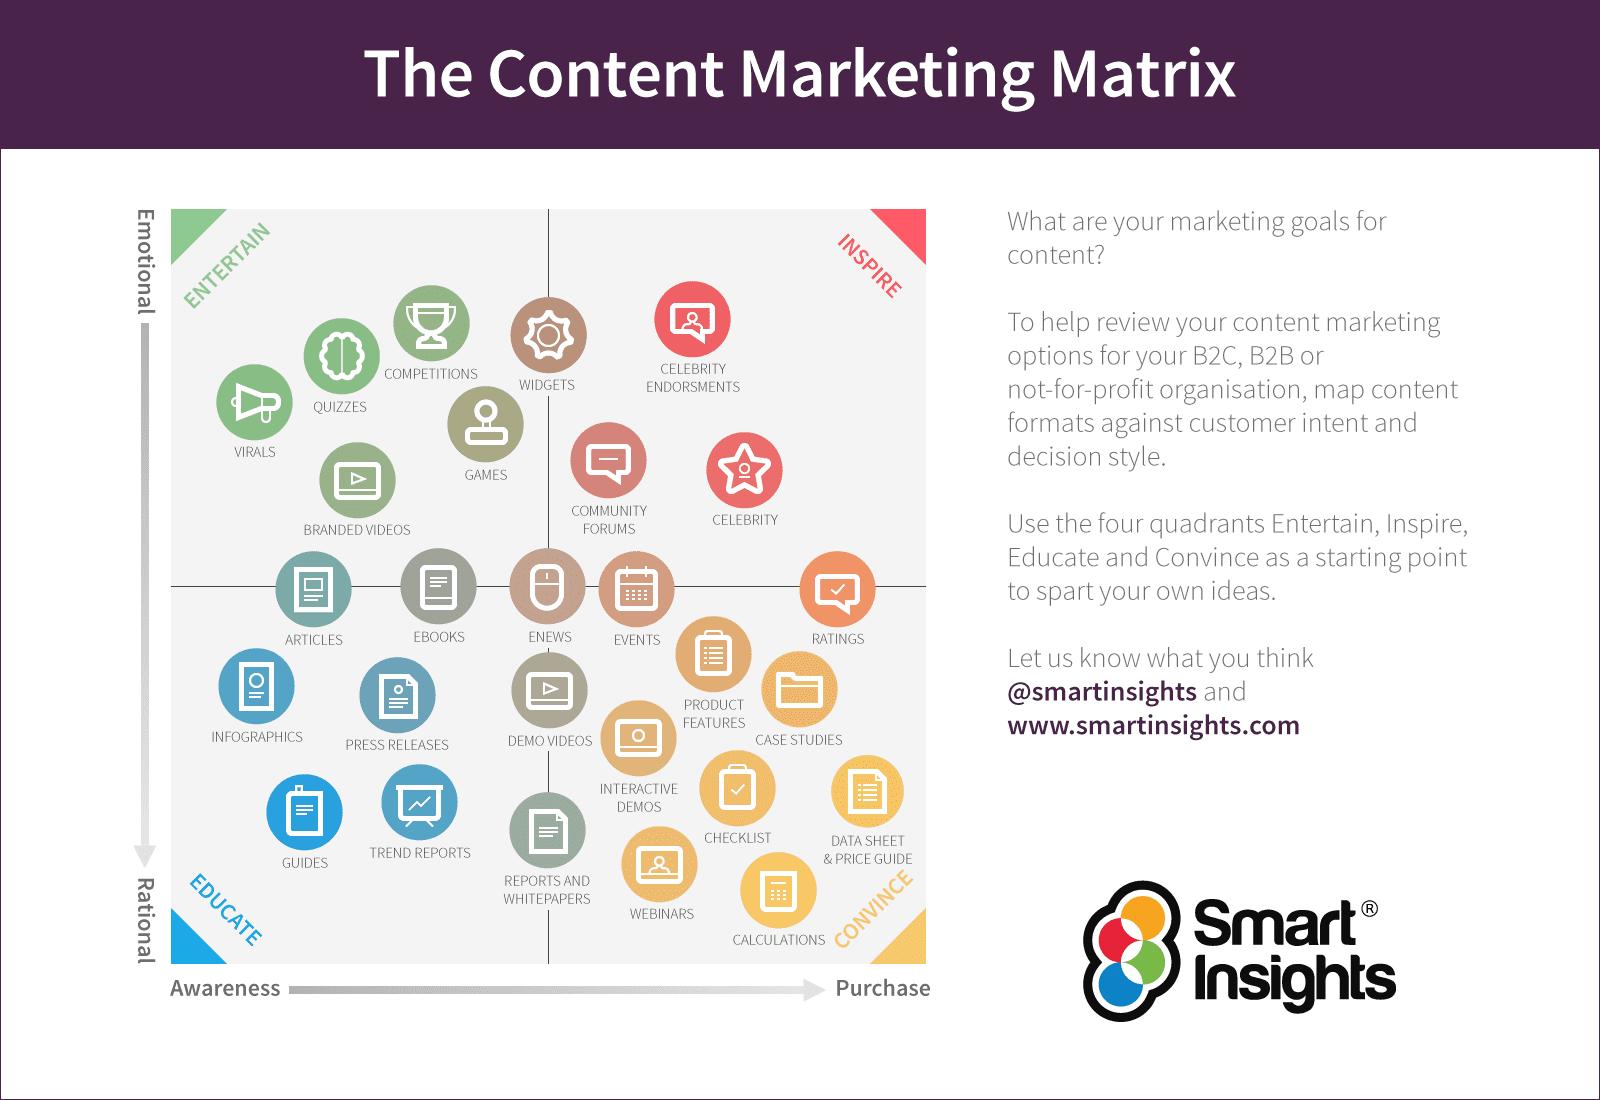 Smart-Insights-Content-Marketing-matrix